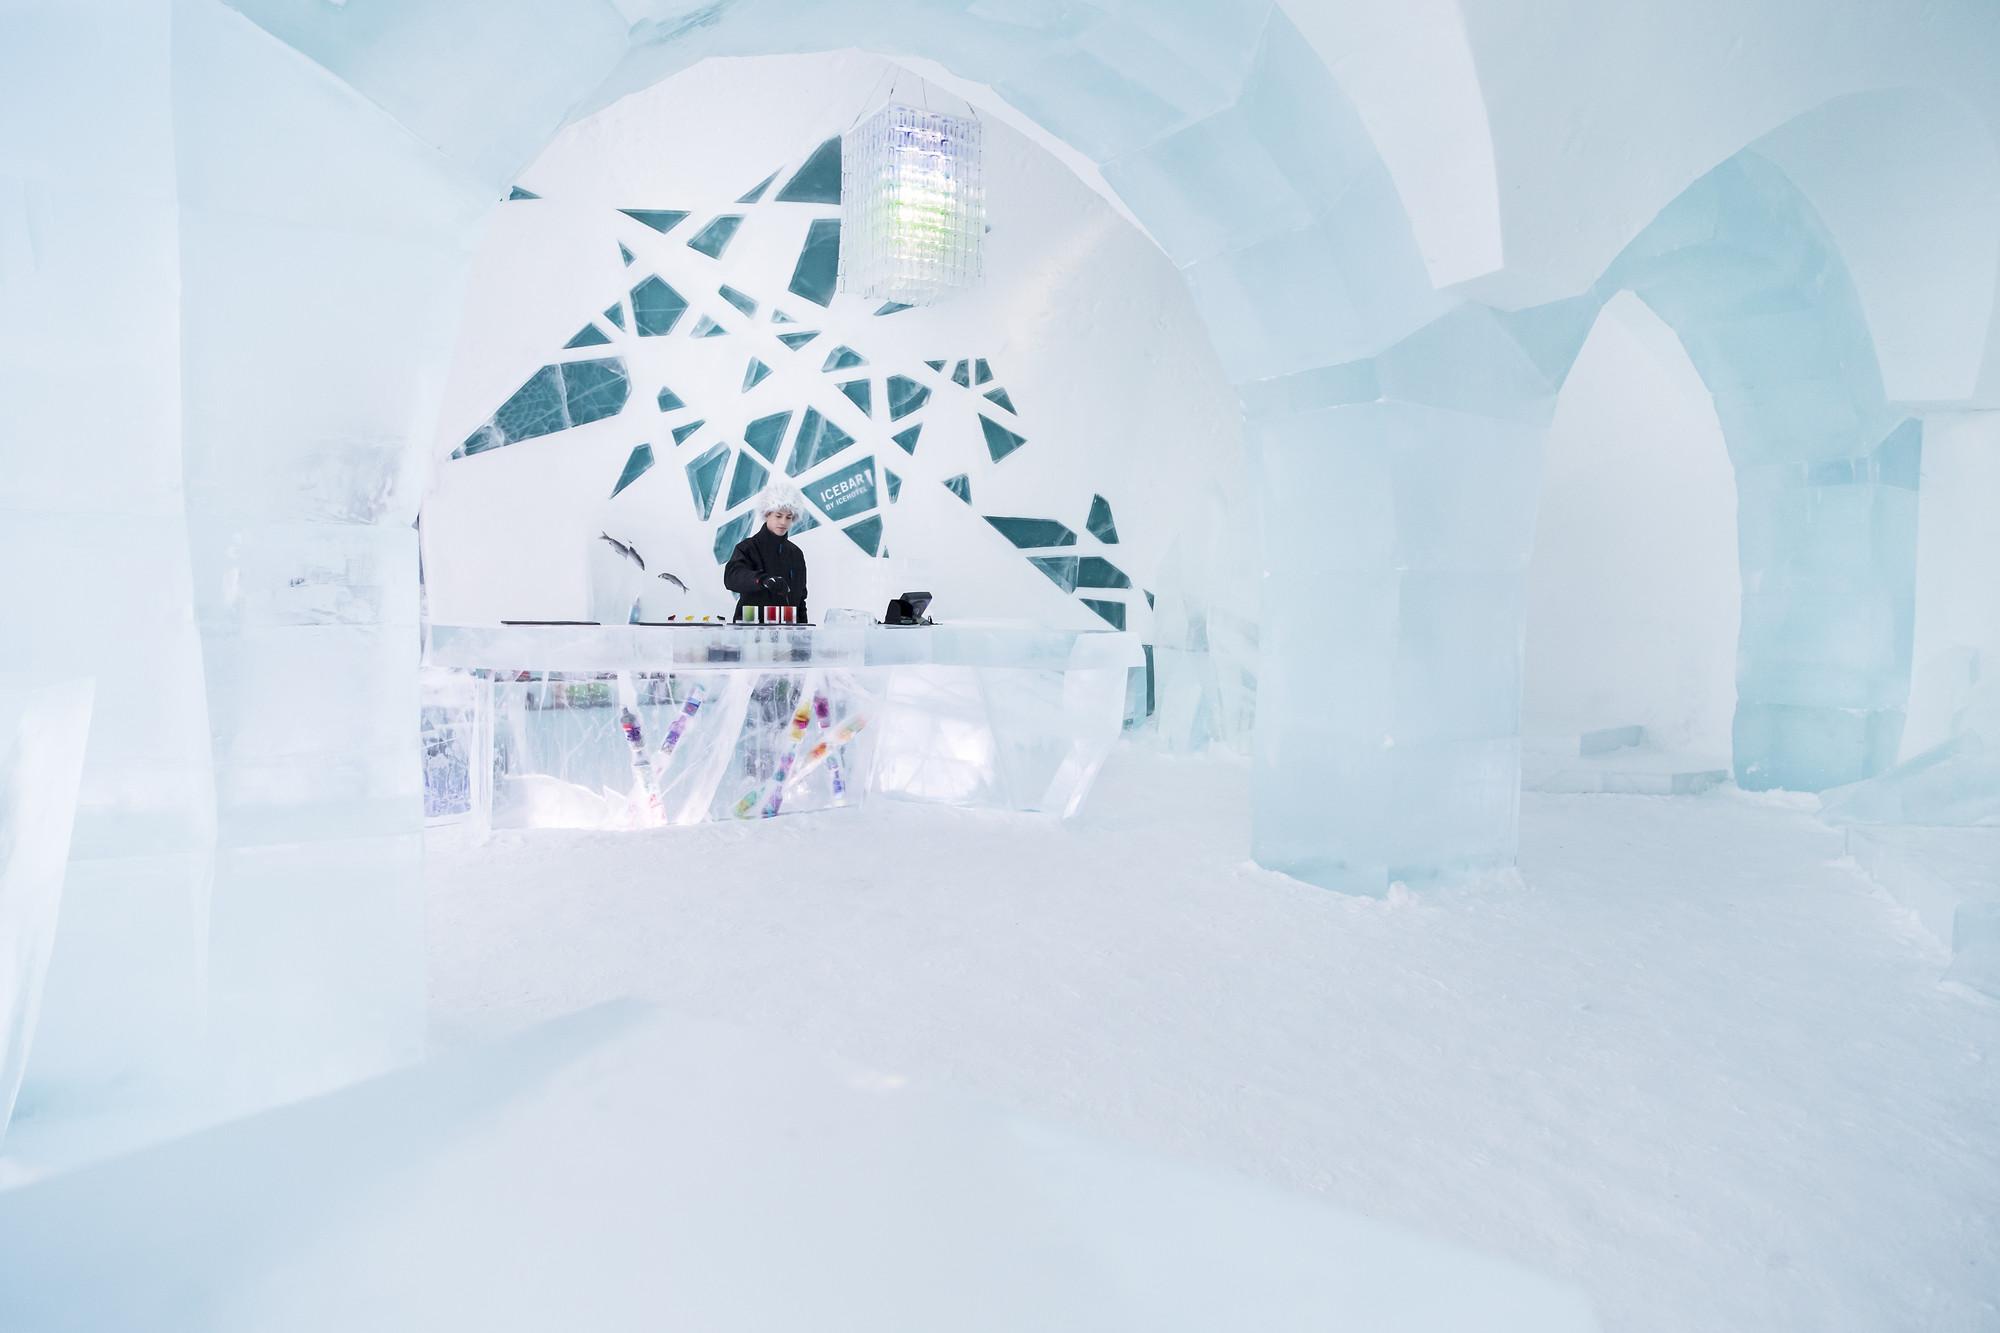 ICEBAR BY ICEHOTEL Jukkasjarvi - Photo © Paulina Holmgren